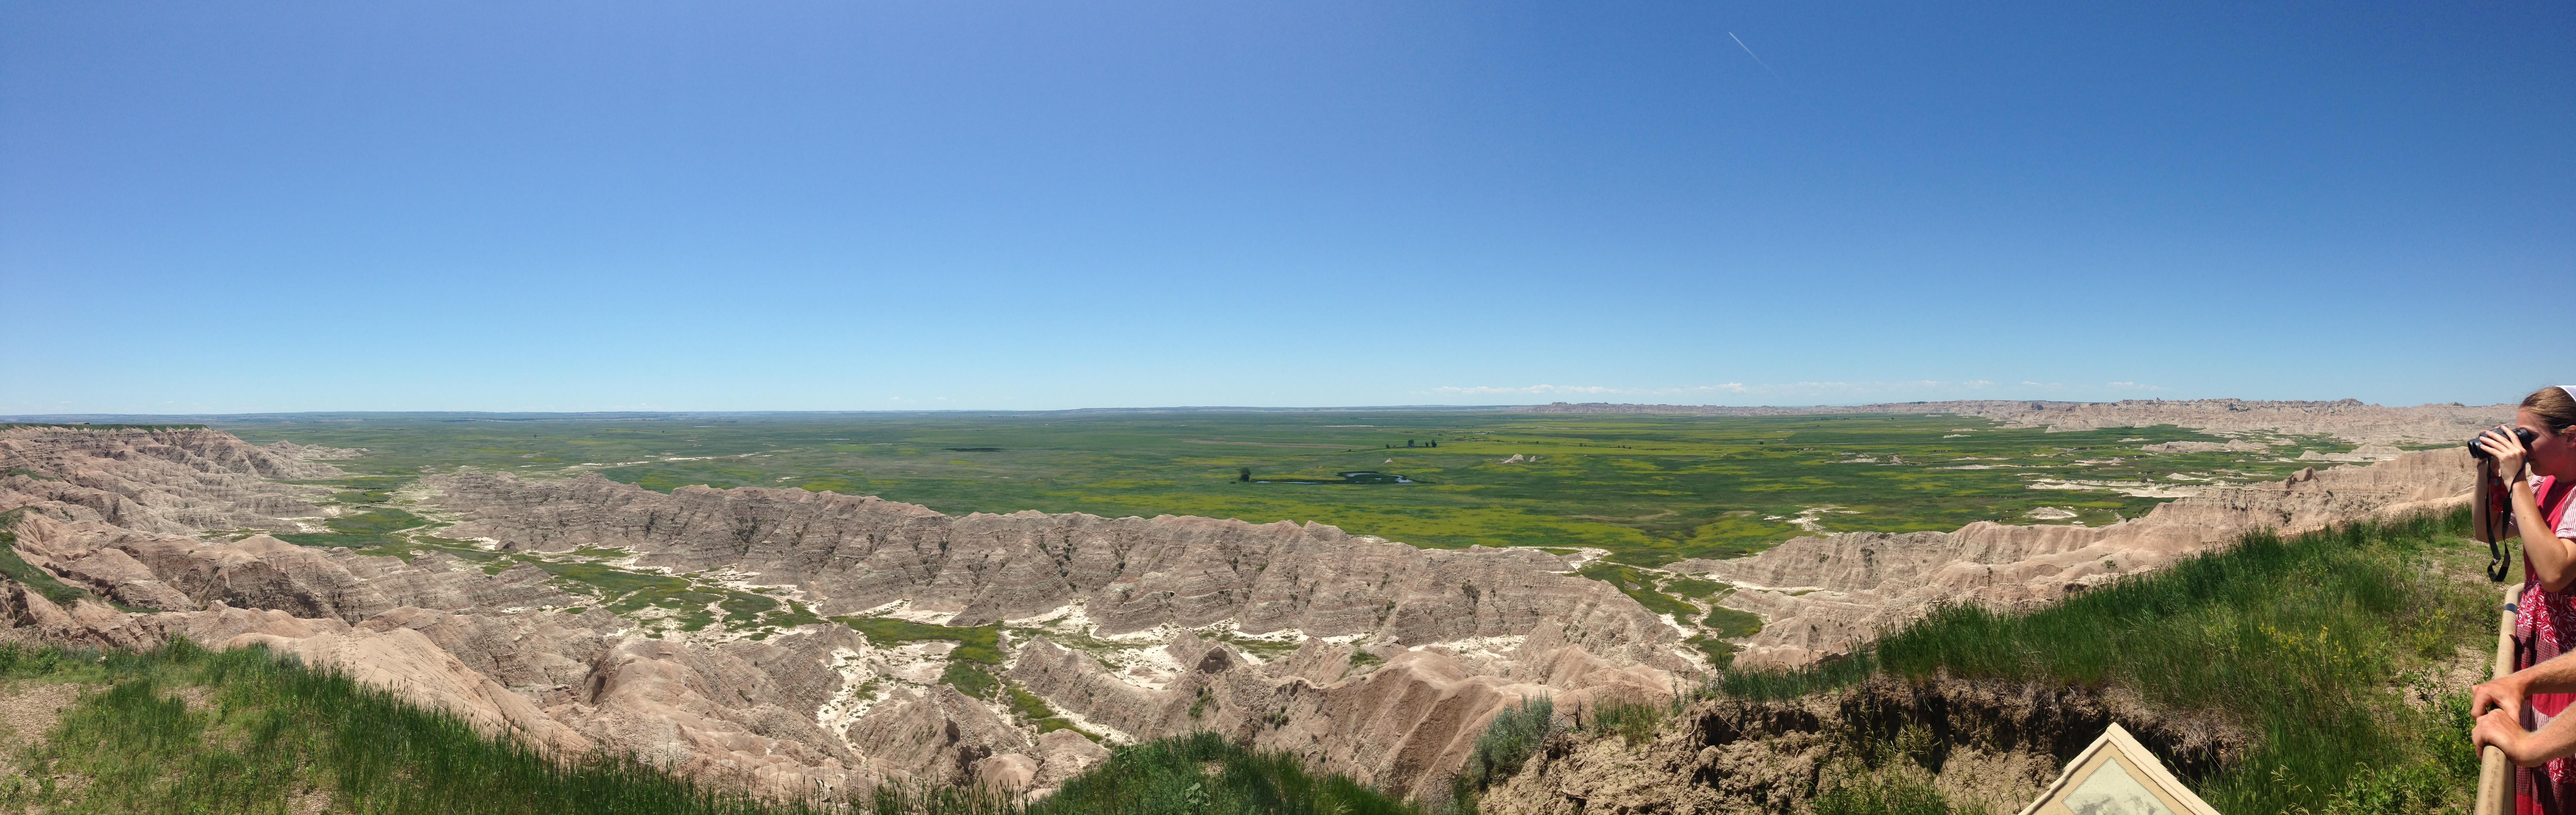 panorama of Badlands